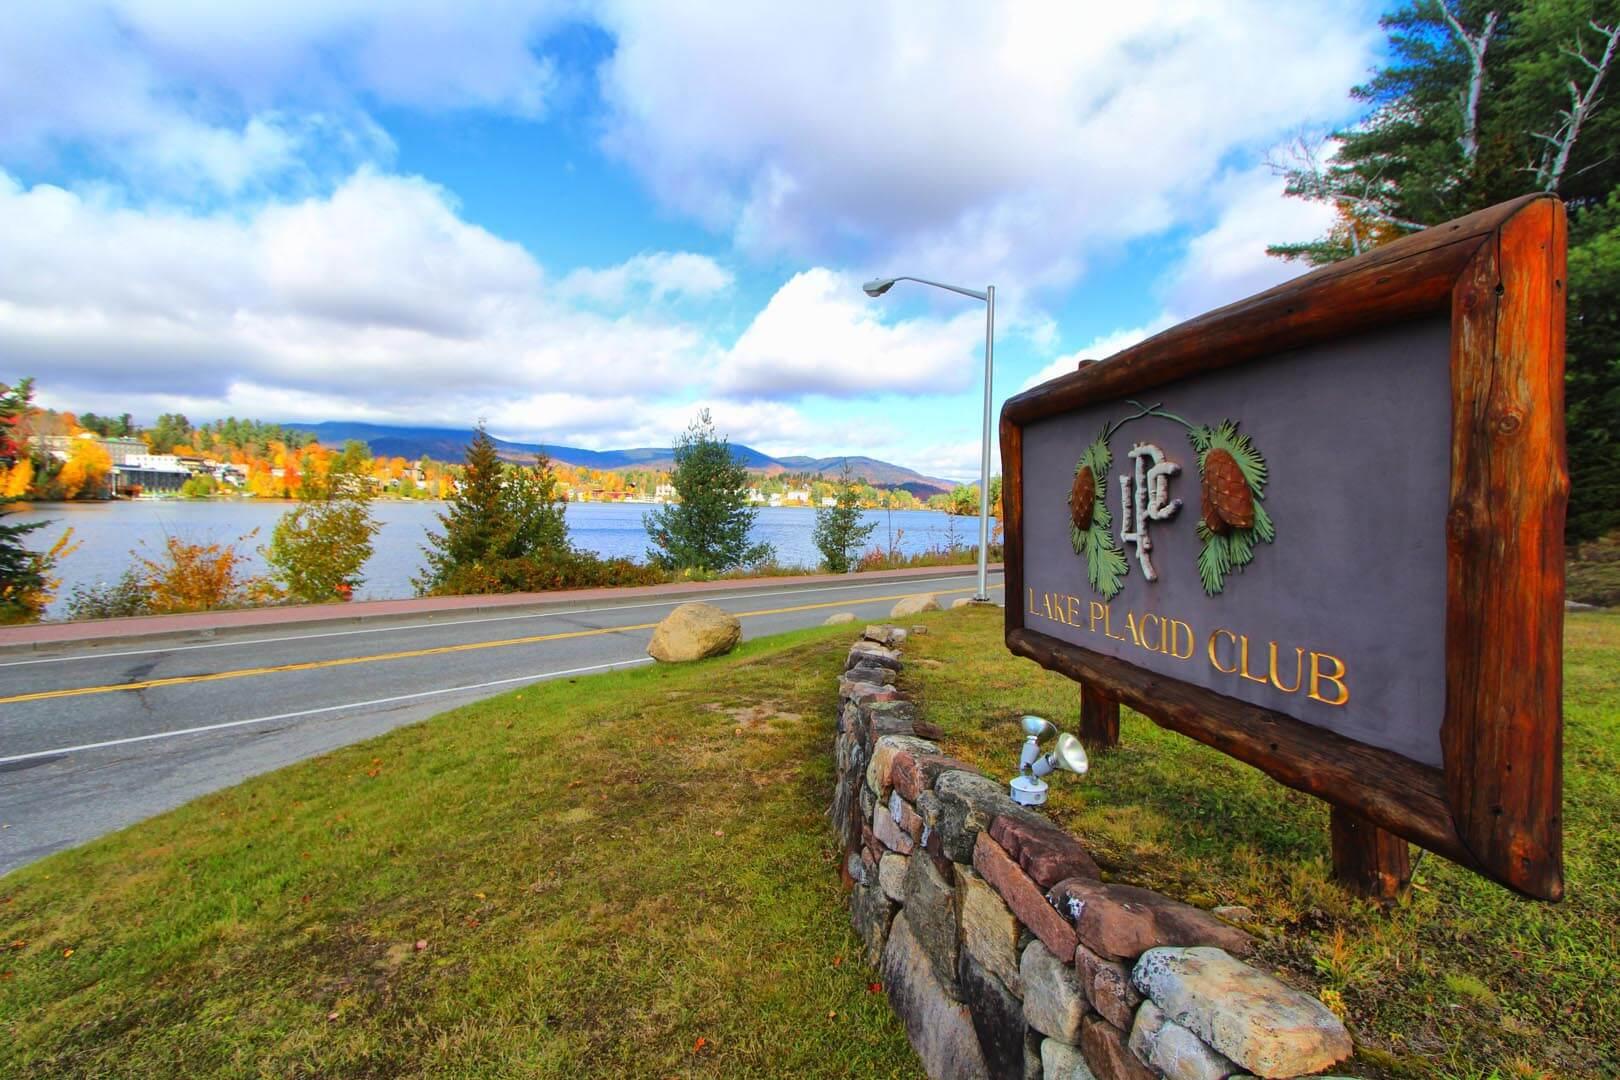 Lake Placid Club Lodges Signage